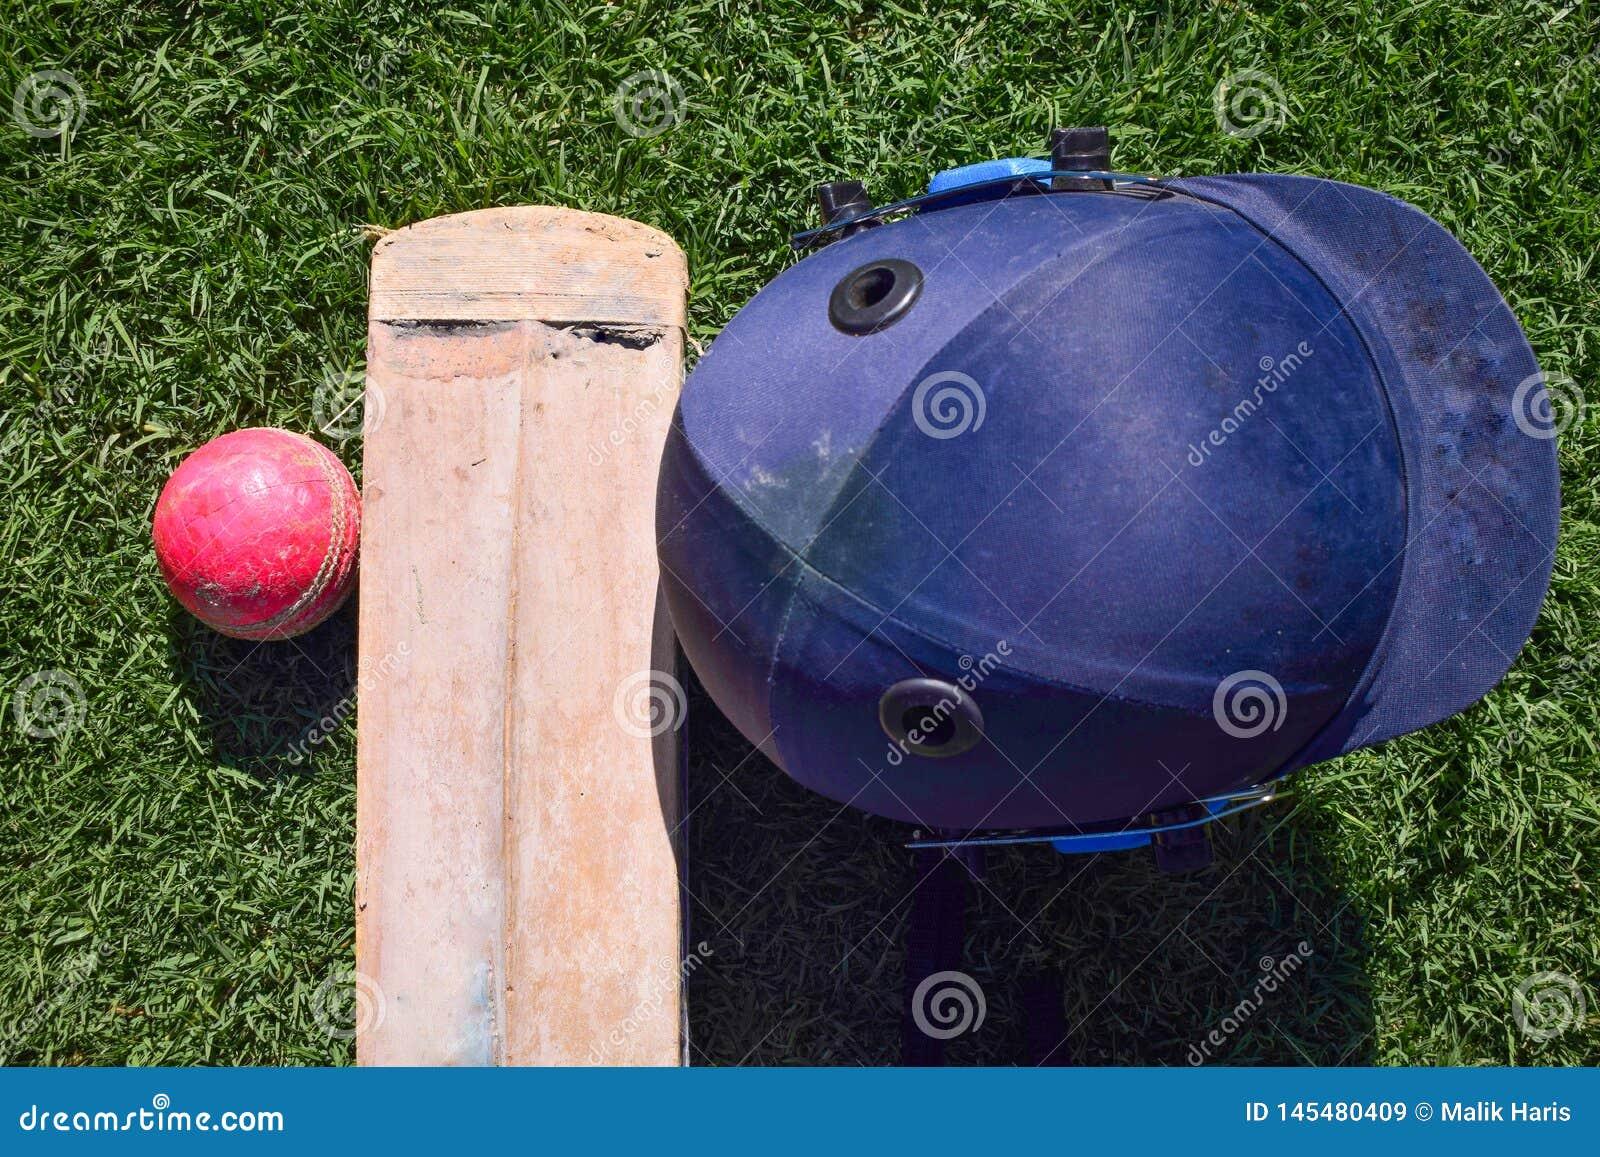 Cricket halmet ,bat, ball isolated on a green grass.